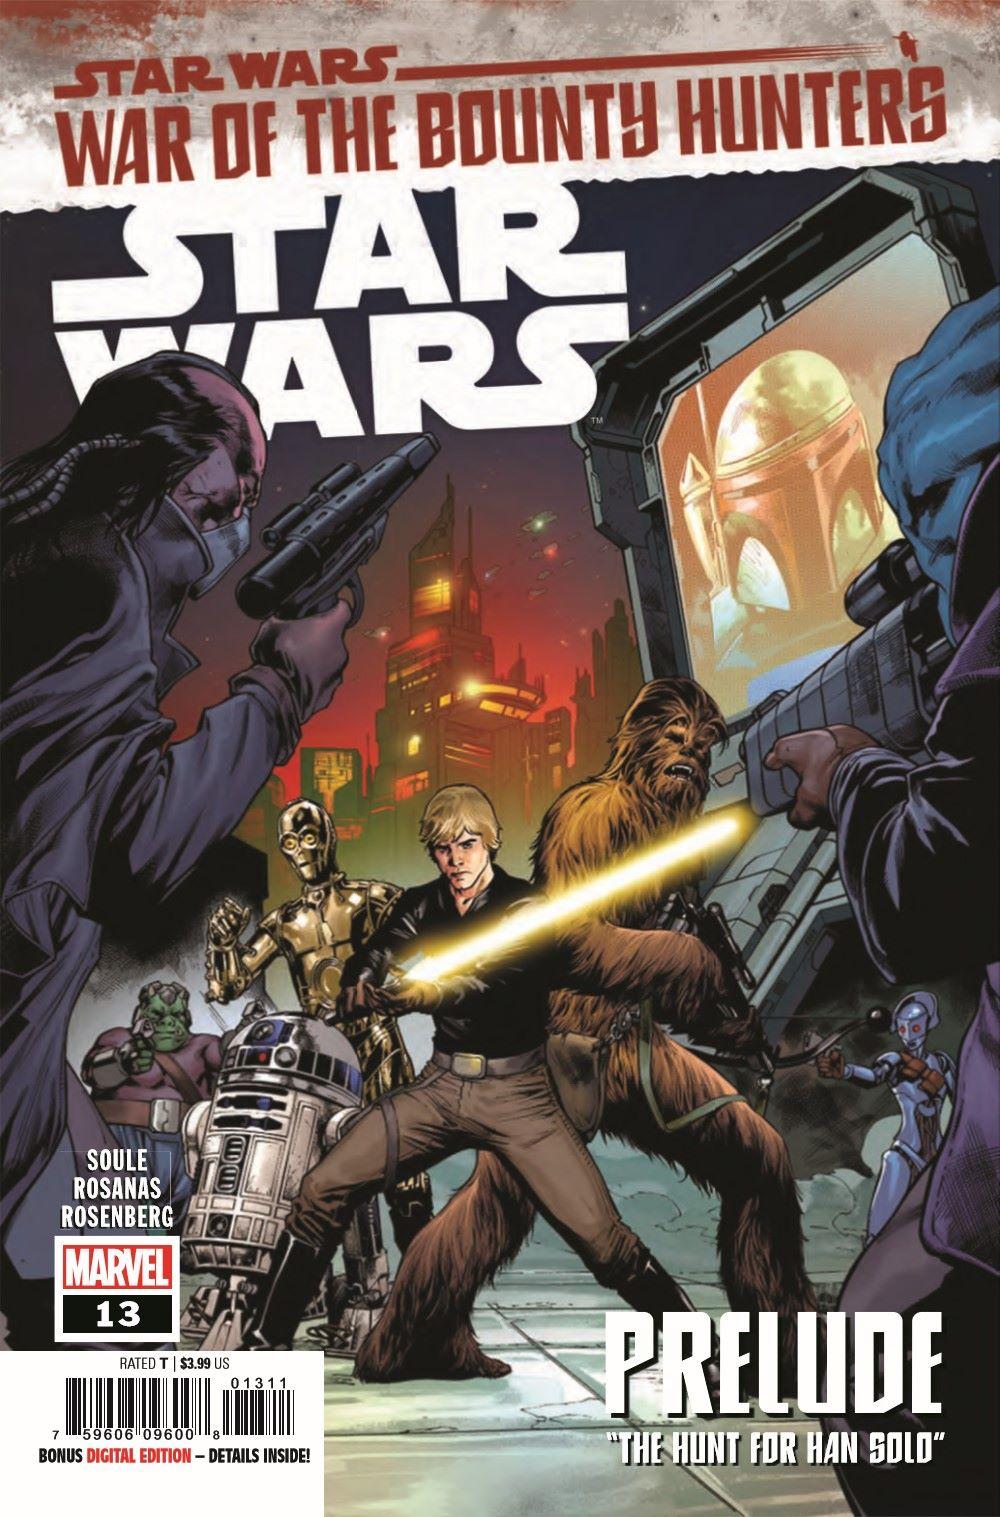 STWARS2020013_Preview-1 ComicList Previews: STAR WARS #13